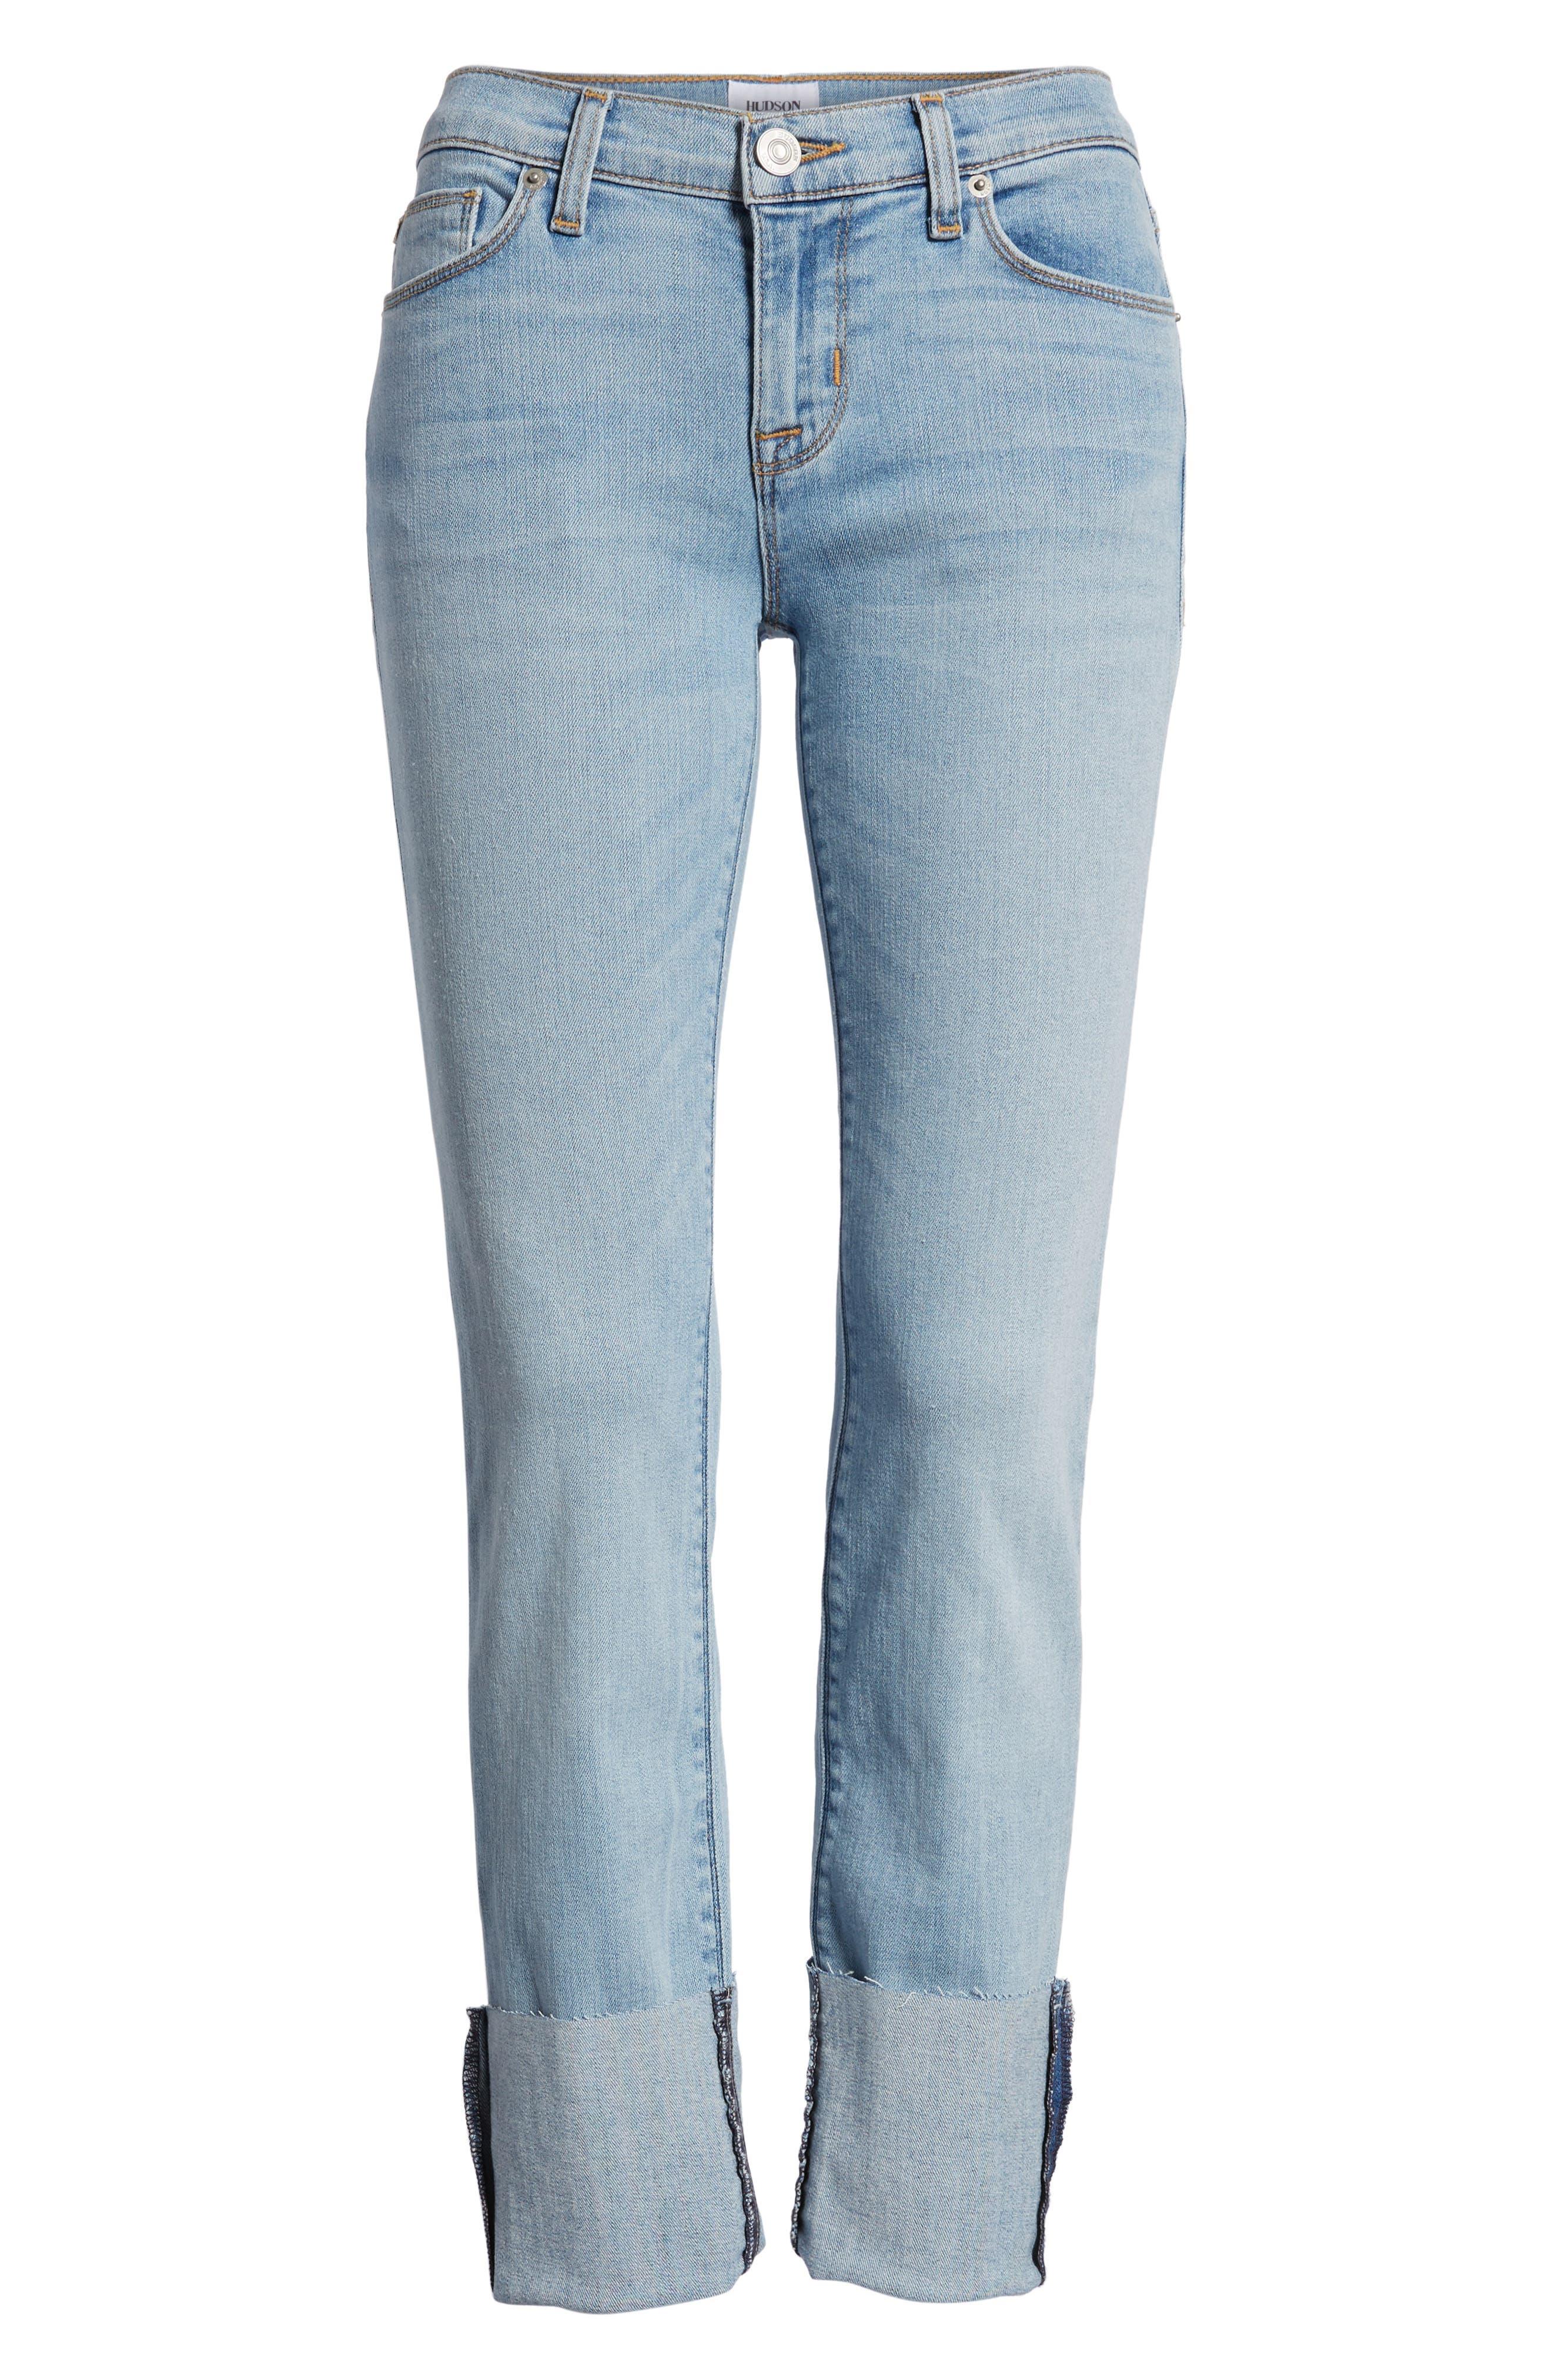 Tally Cuffed Crop Skinny Jeans,                             Alternate thumbnail 7, color,                             Gemini